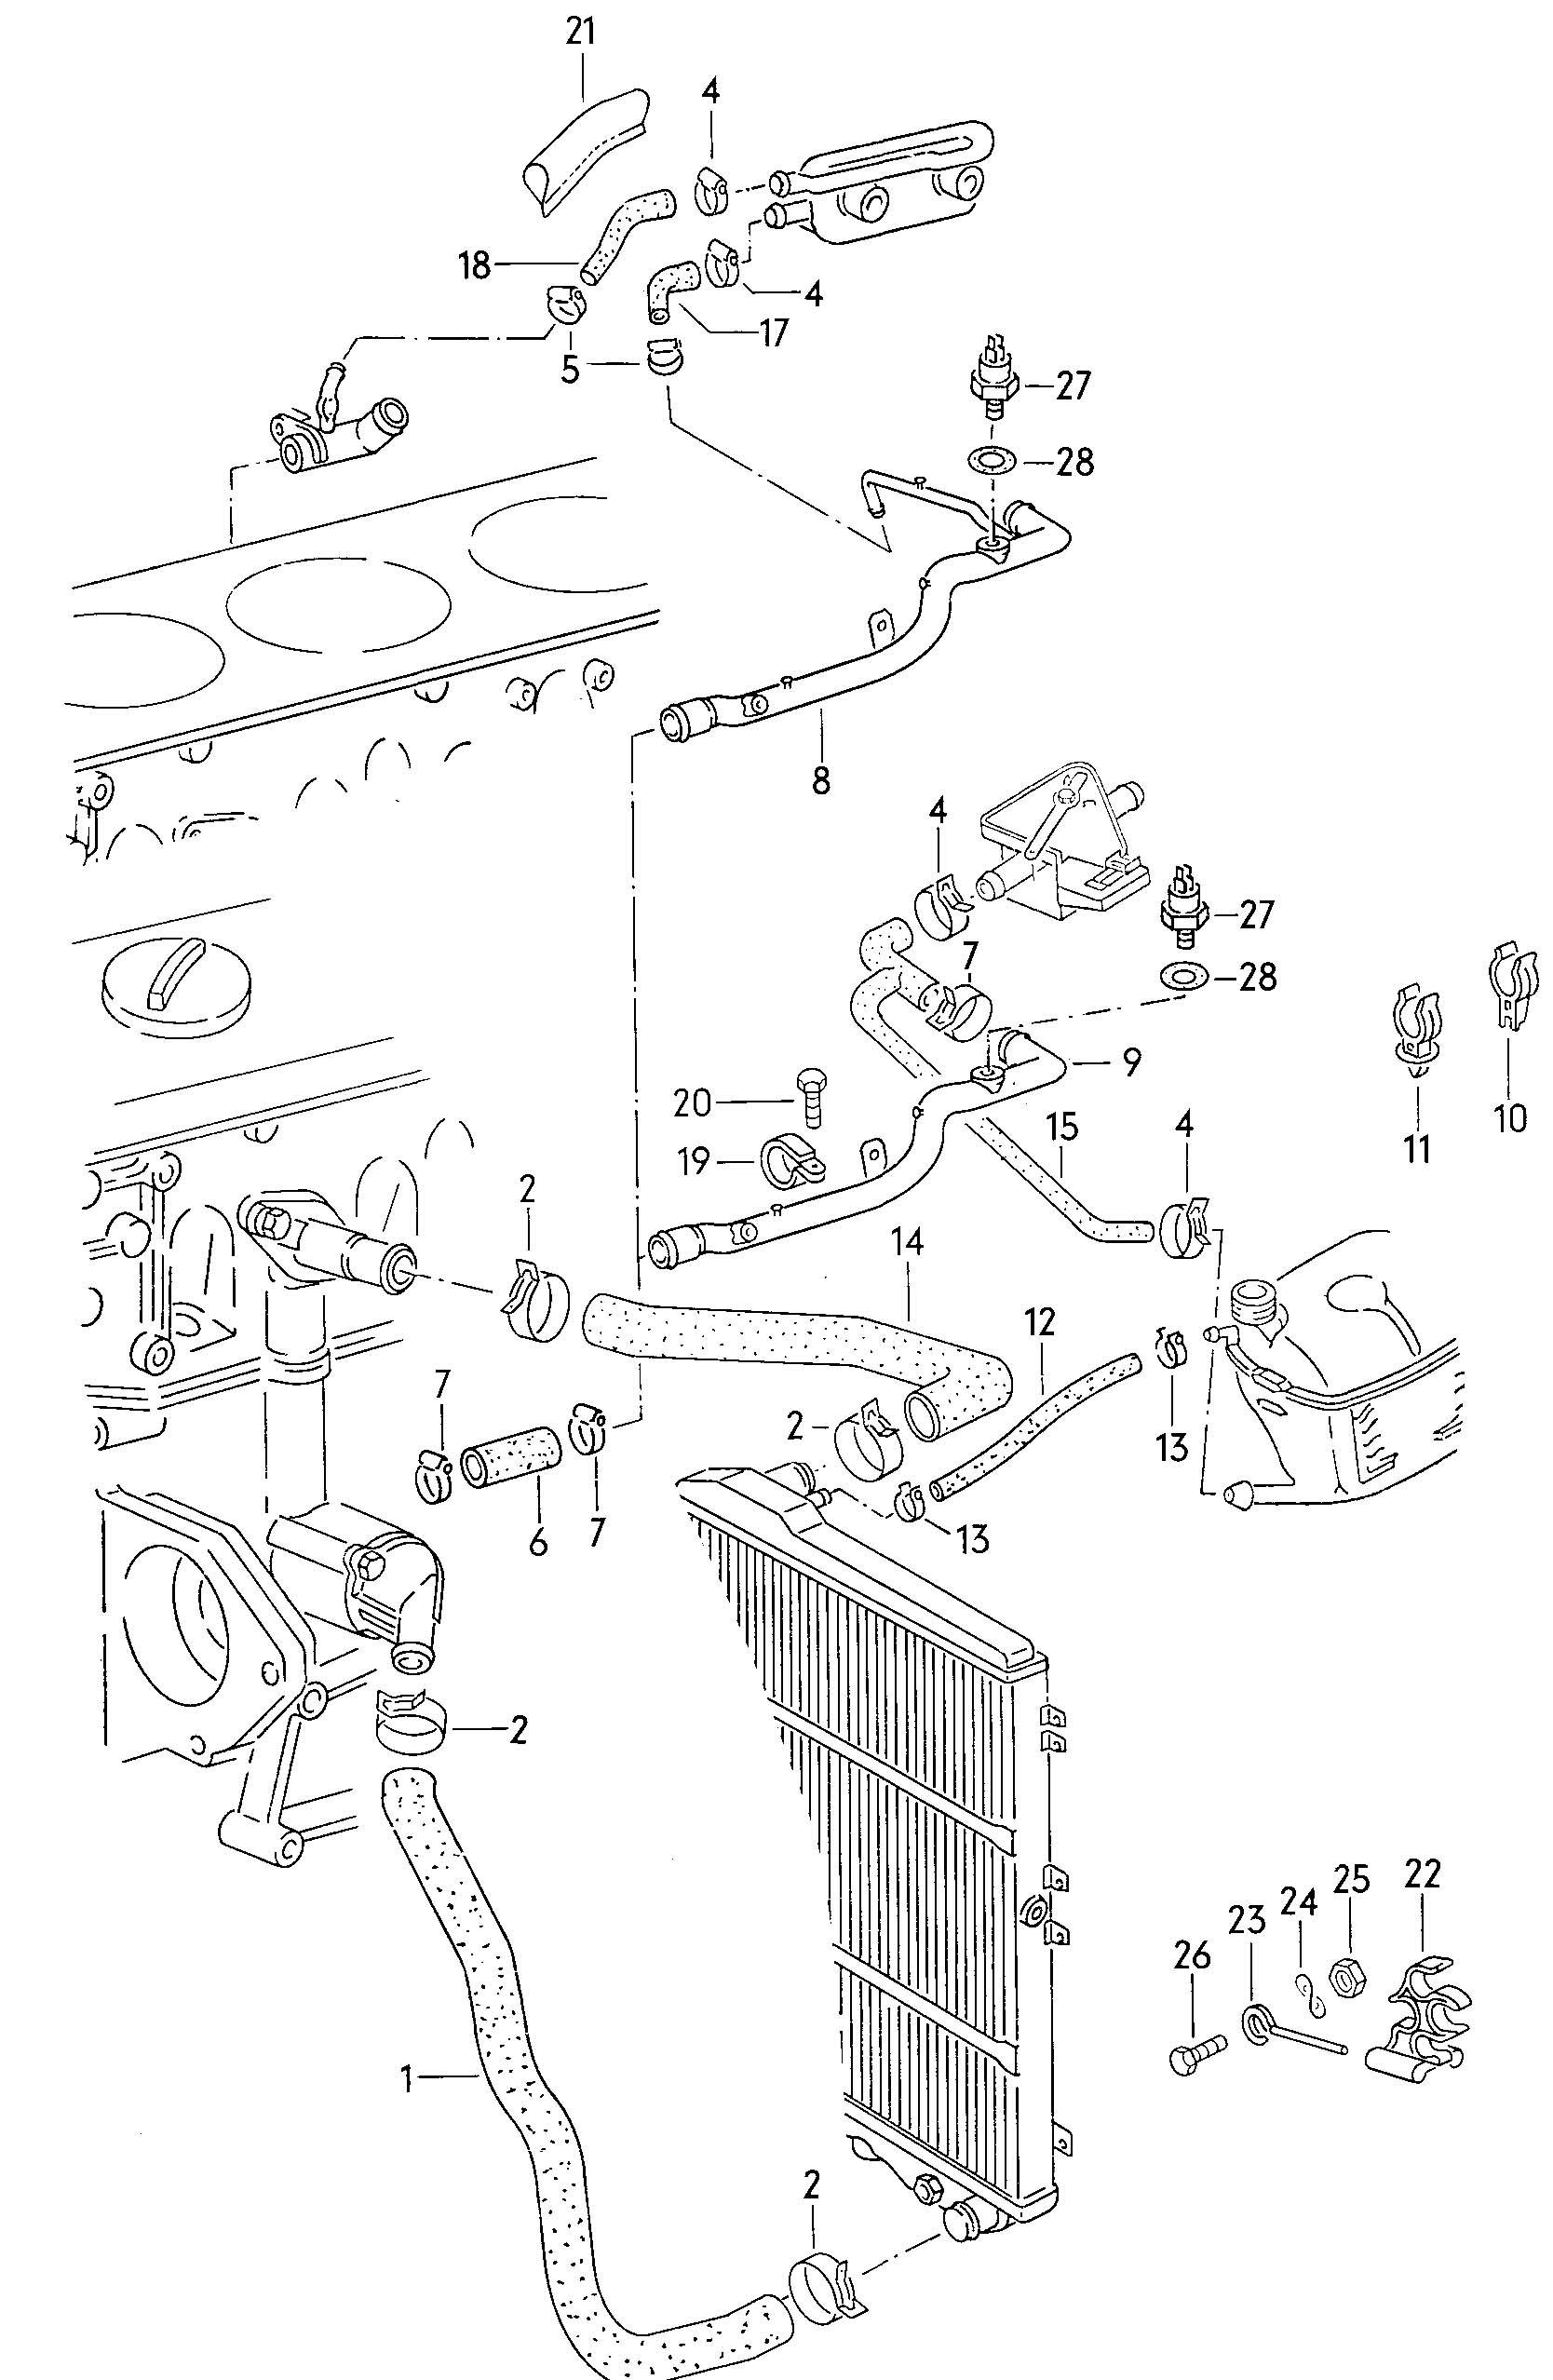 Eagle Light Switch Diagram